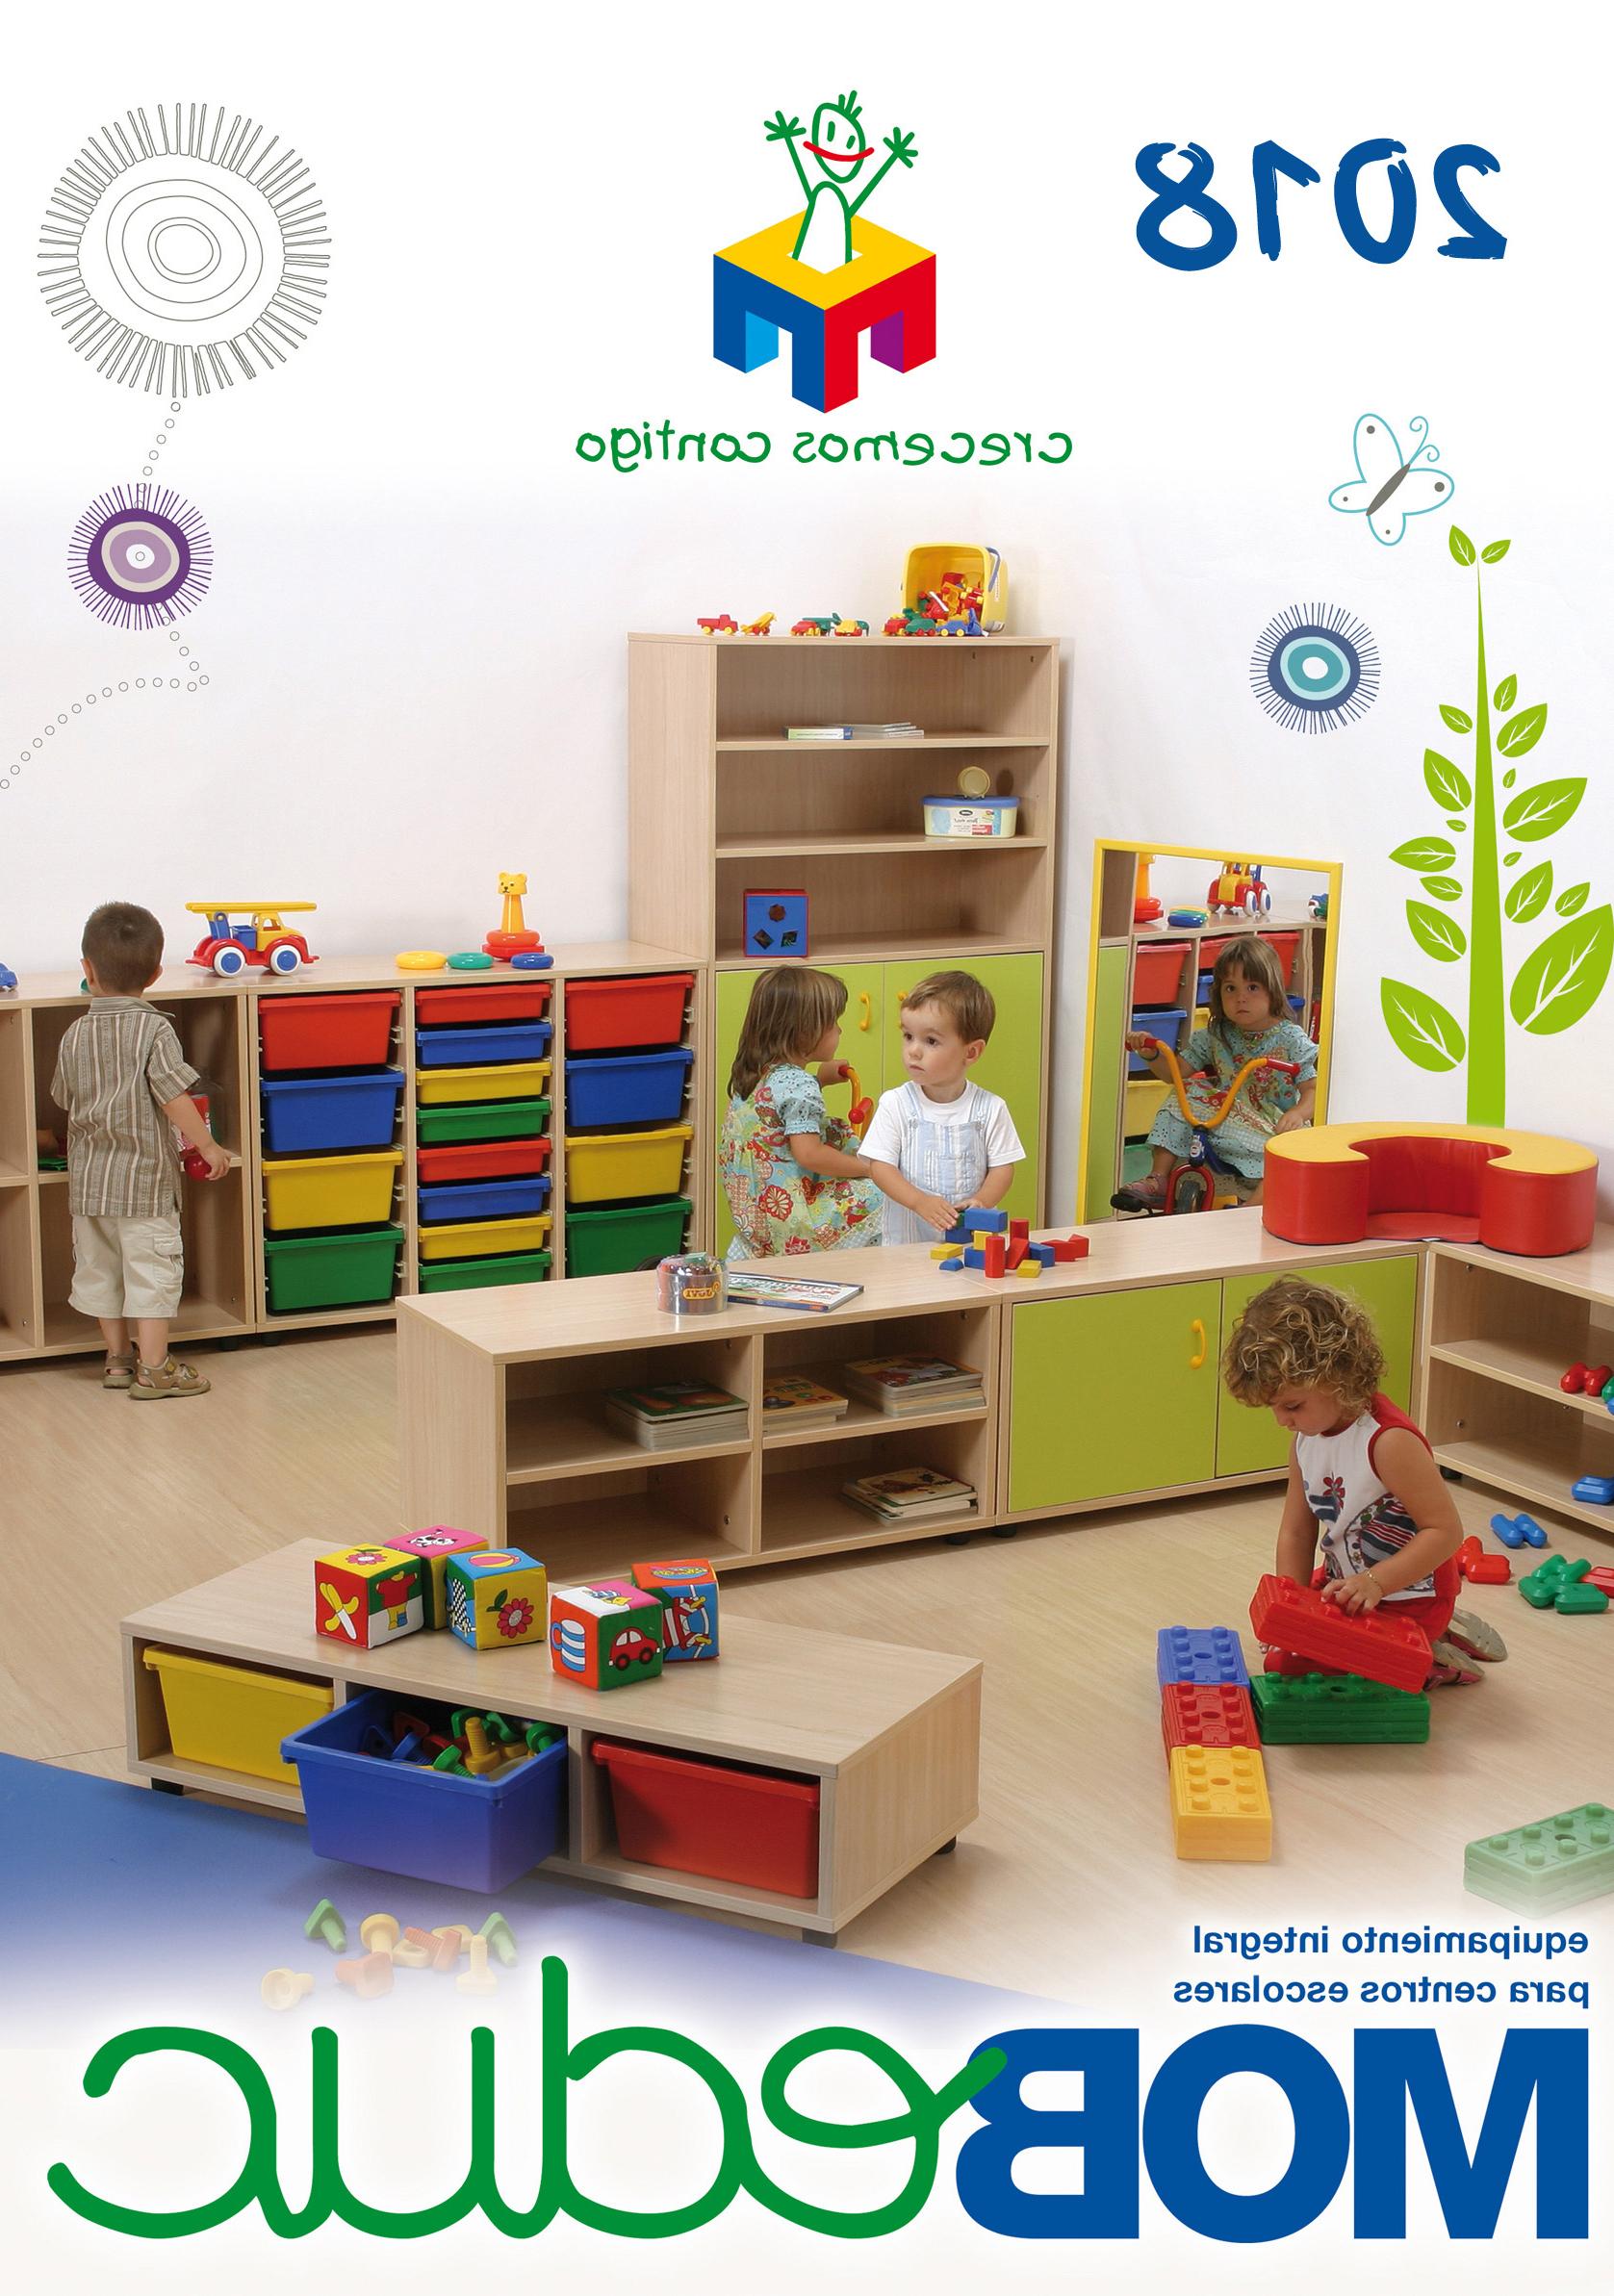 Mobiliario Escolar Infantil Whdr Mobiliario Escolar Catà Logos Mobiliario Infantil Mobeduc